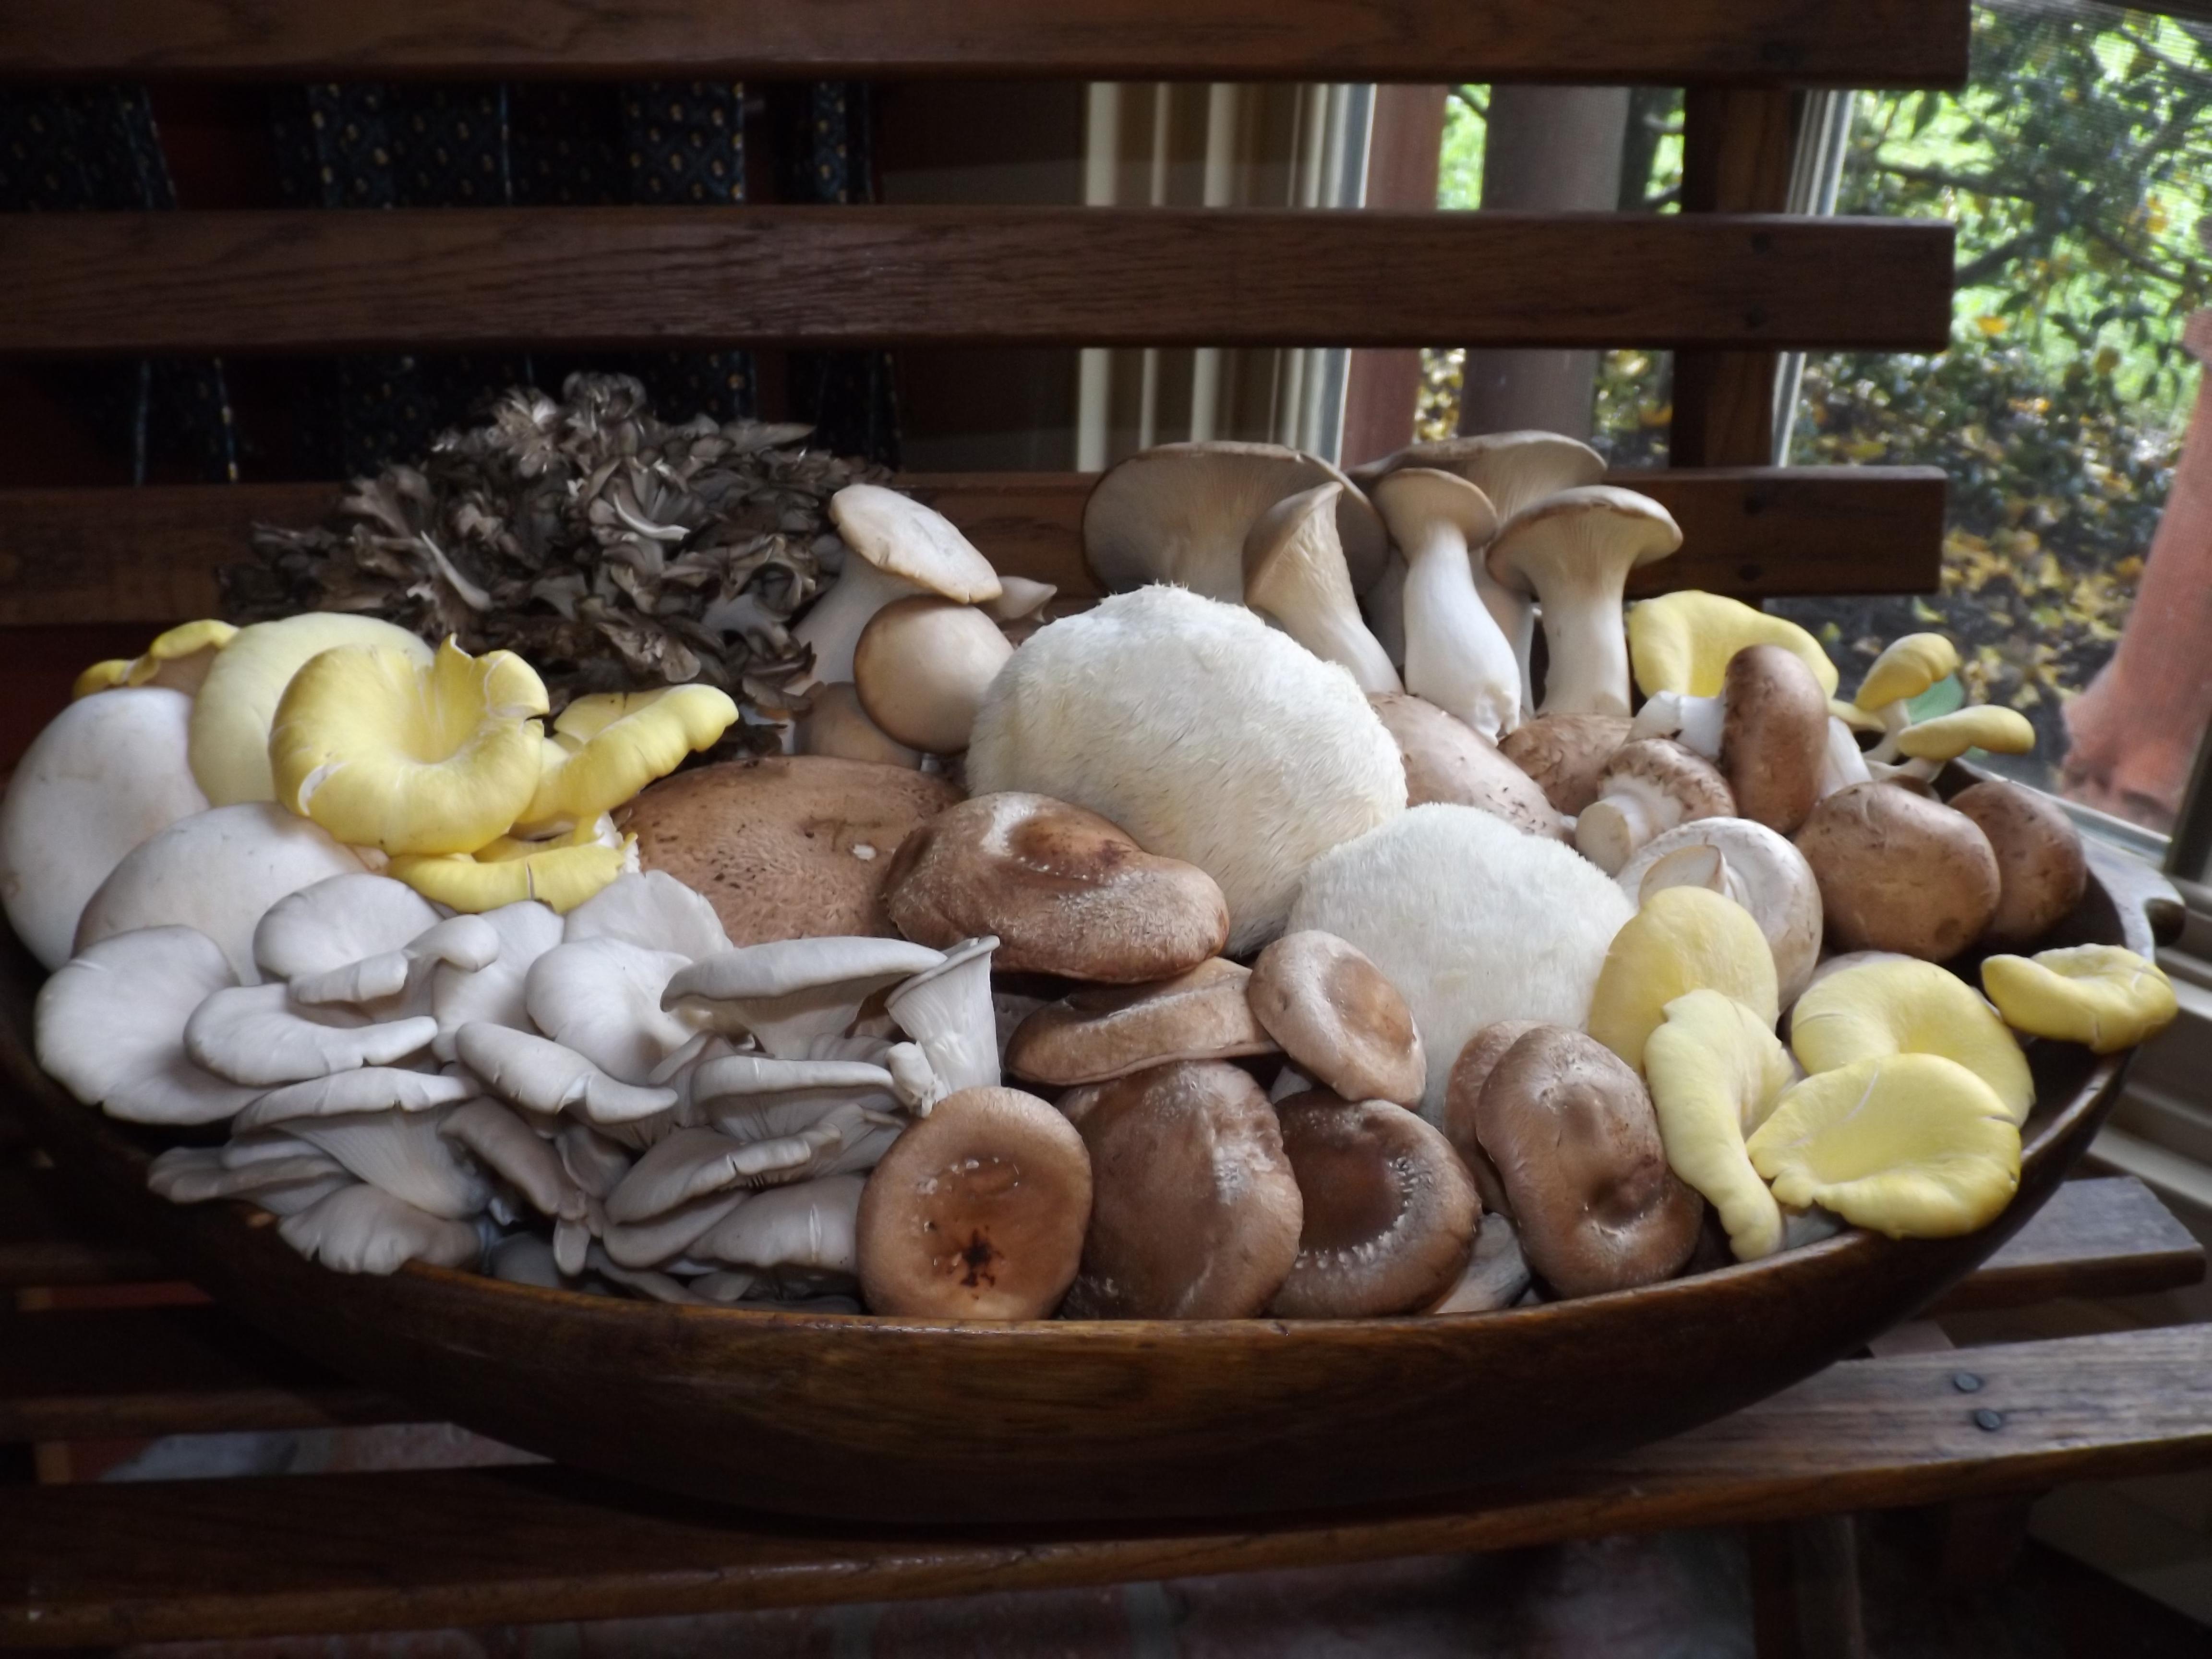 Phillips mushroom bowl